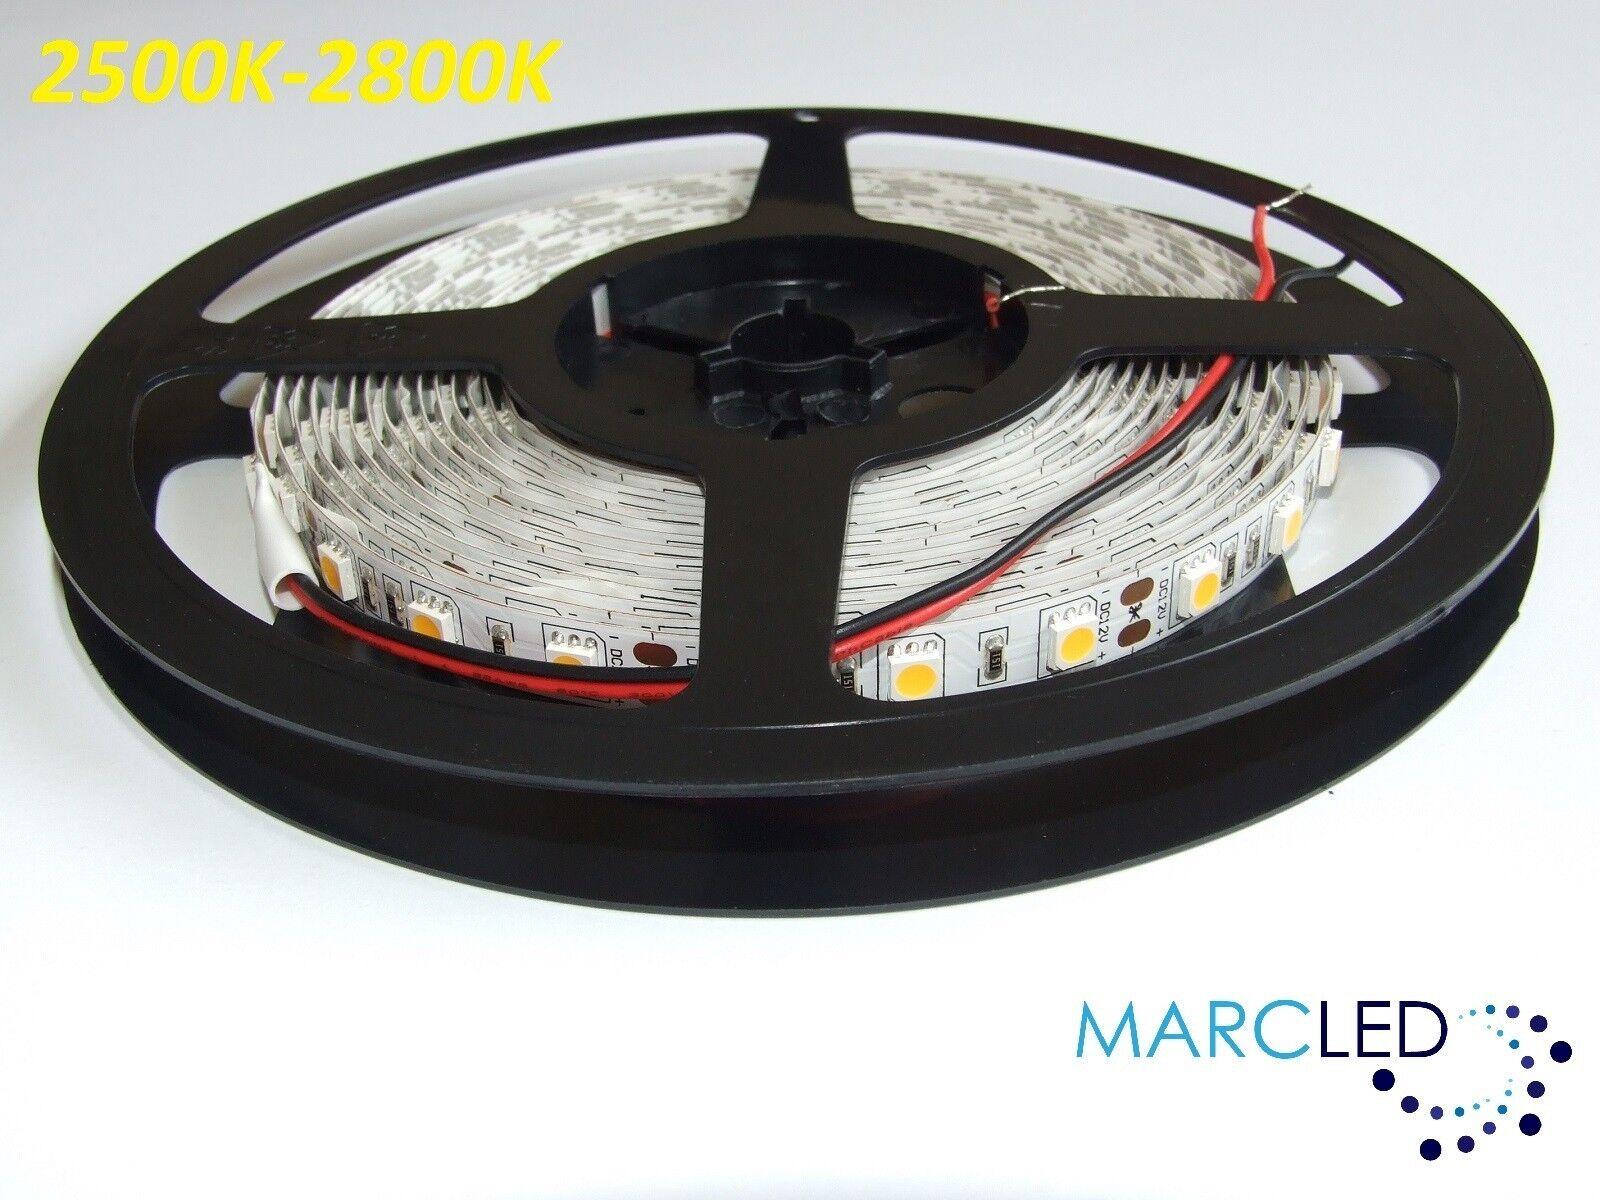 12 V Cc SMD5050 tira de LED 2500k-2800k, 5m (72w, 300leds), Ip20, 60leds m, 14,4 W m